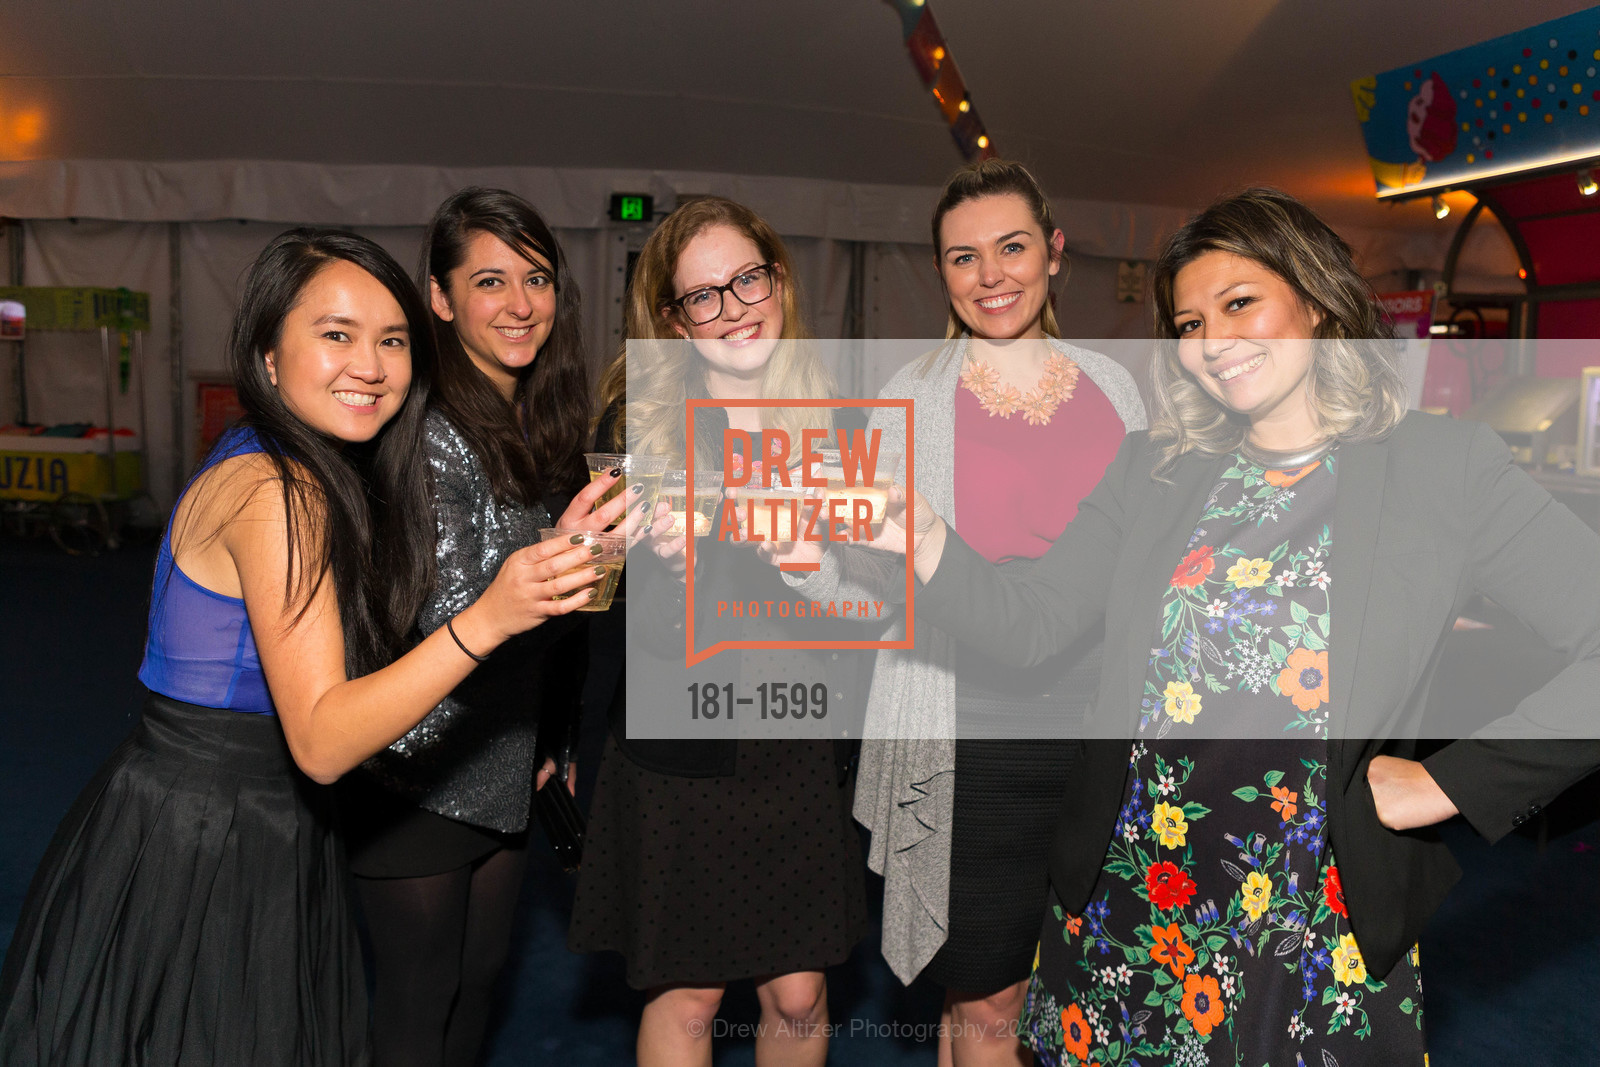 Meg Panlaqui, Kyra Geithman, Mary Young, Chantal Lasher, Dianna Cavagnaro, Photo #181-1599